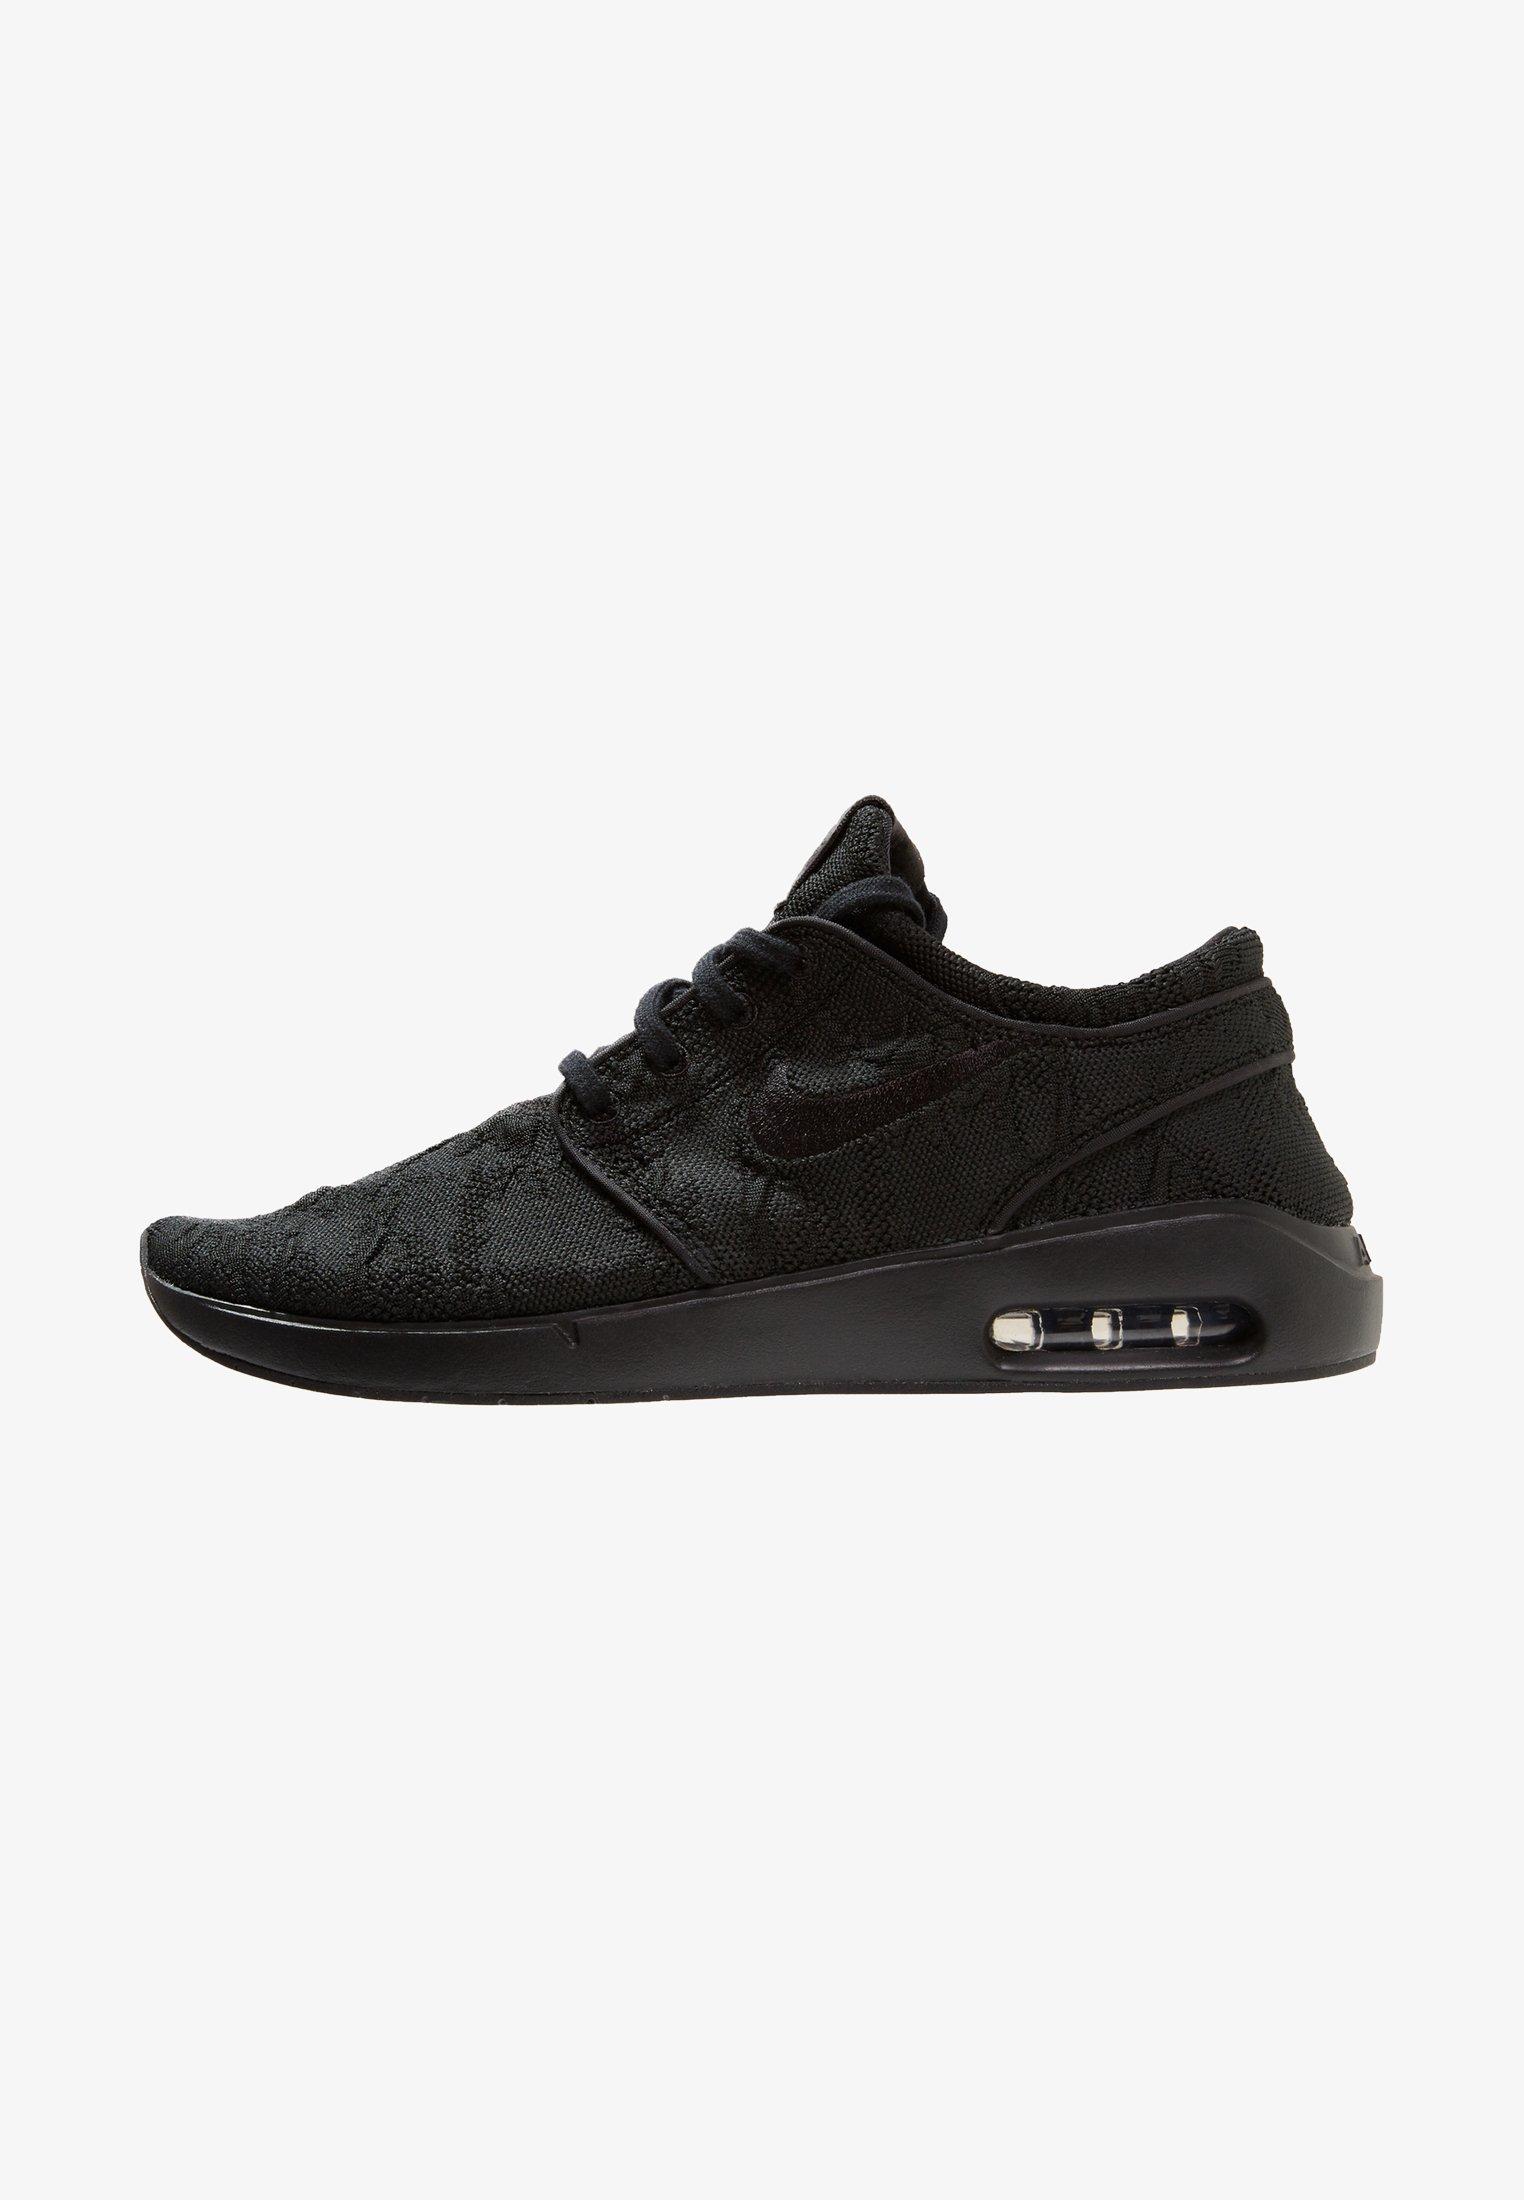 Víspera sílaba Pronunciar  Nike SB AIR MAX JANOSKI 2 - Trainers - black - Zalando.co.uk